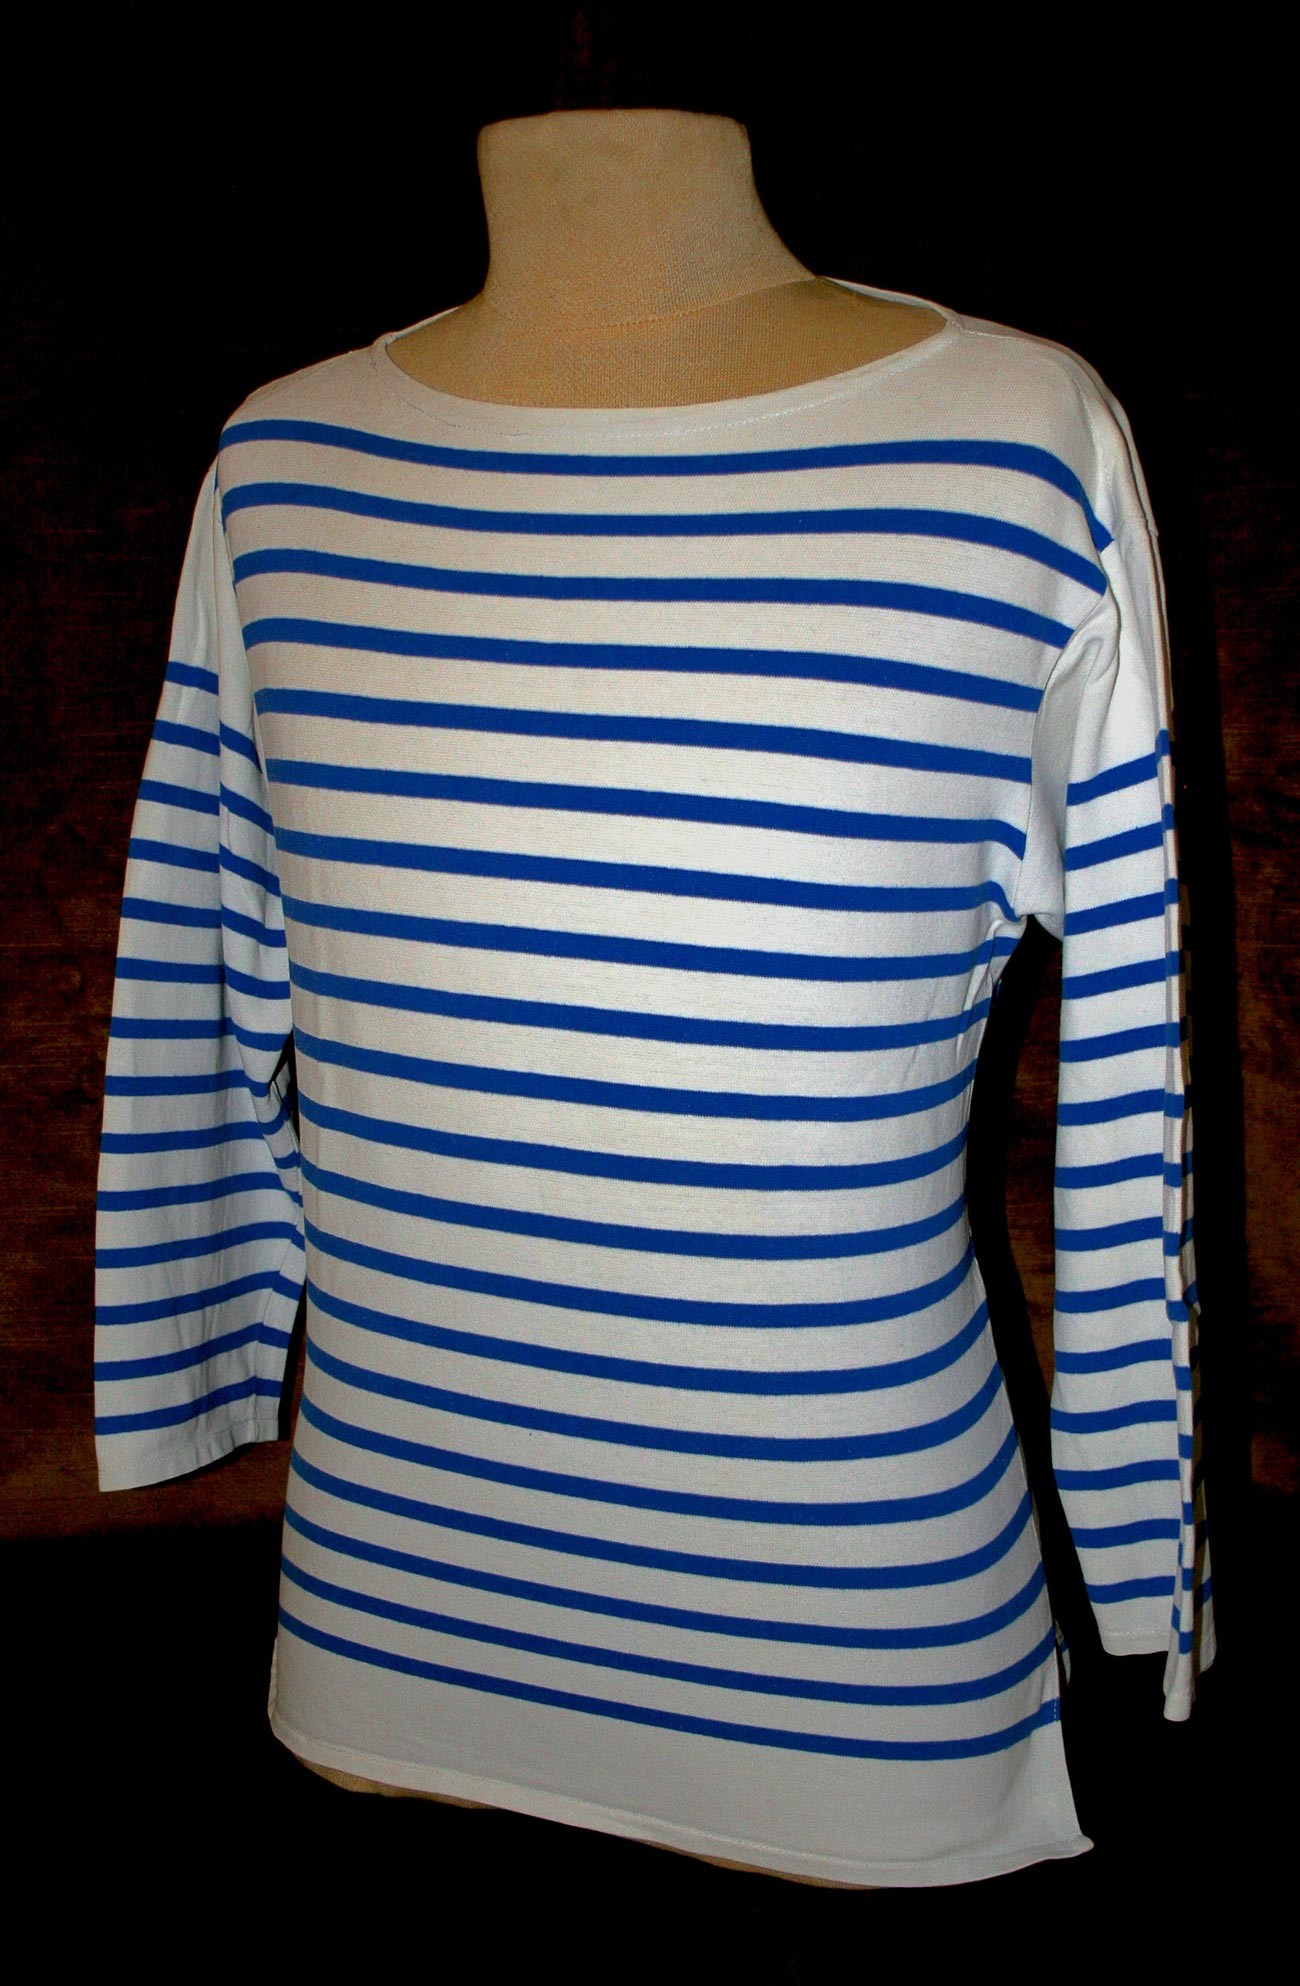 Marinière (Breton shirt) of the French Navy